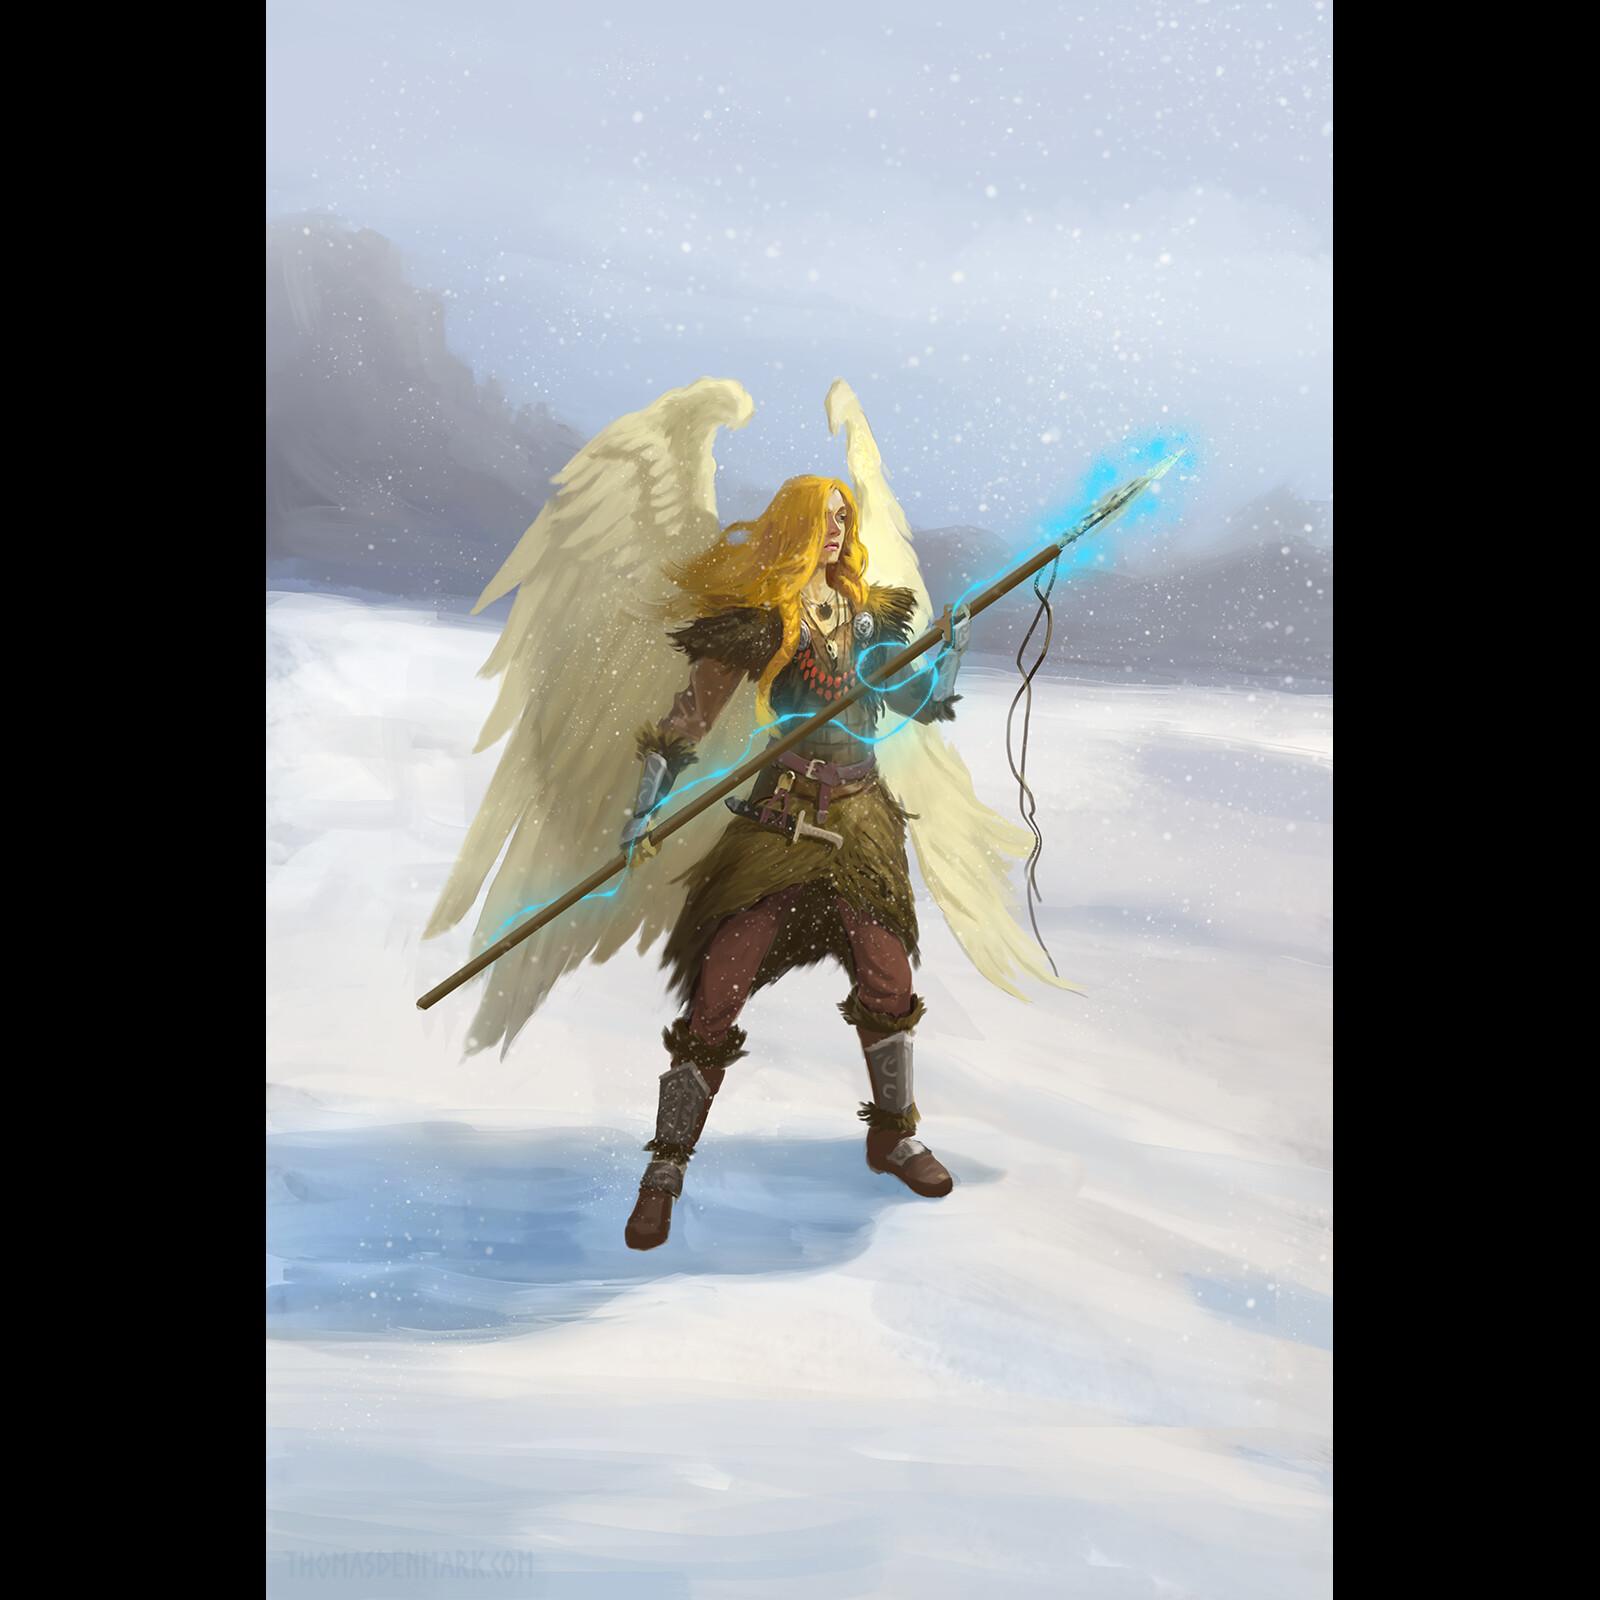 Rota Freyasdottir - Valkyrie of Sleet